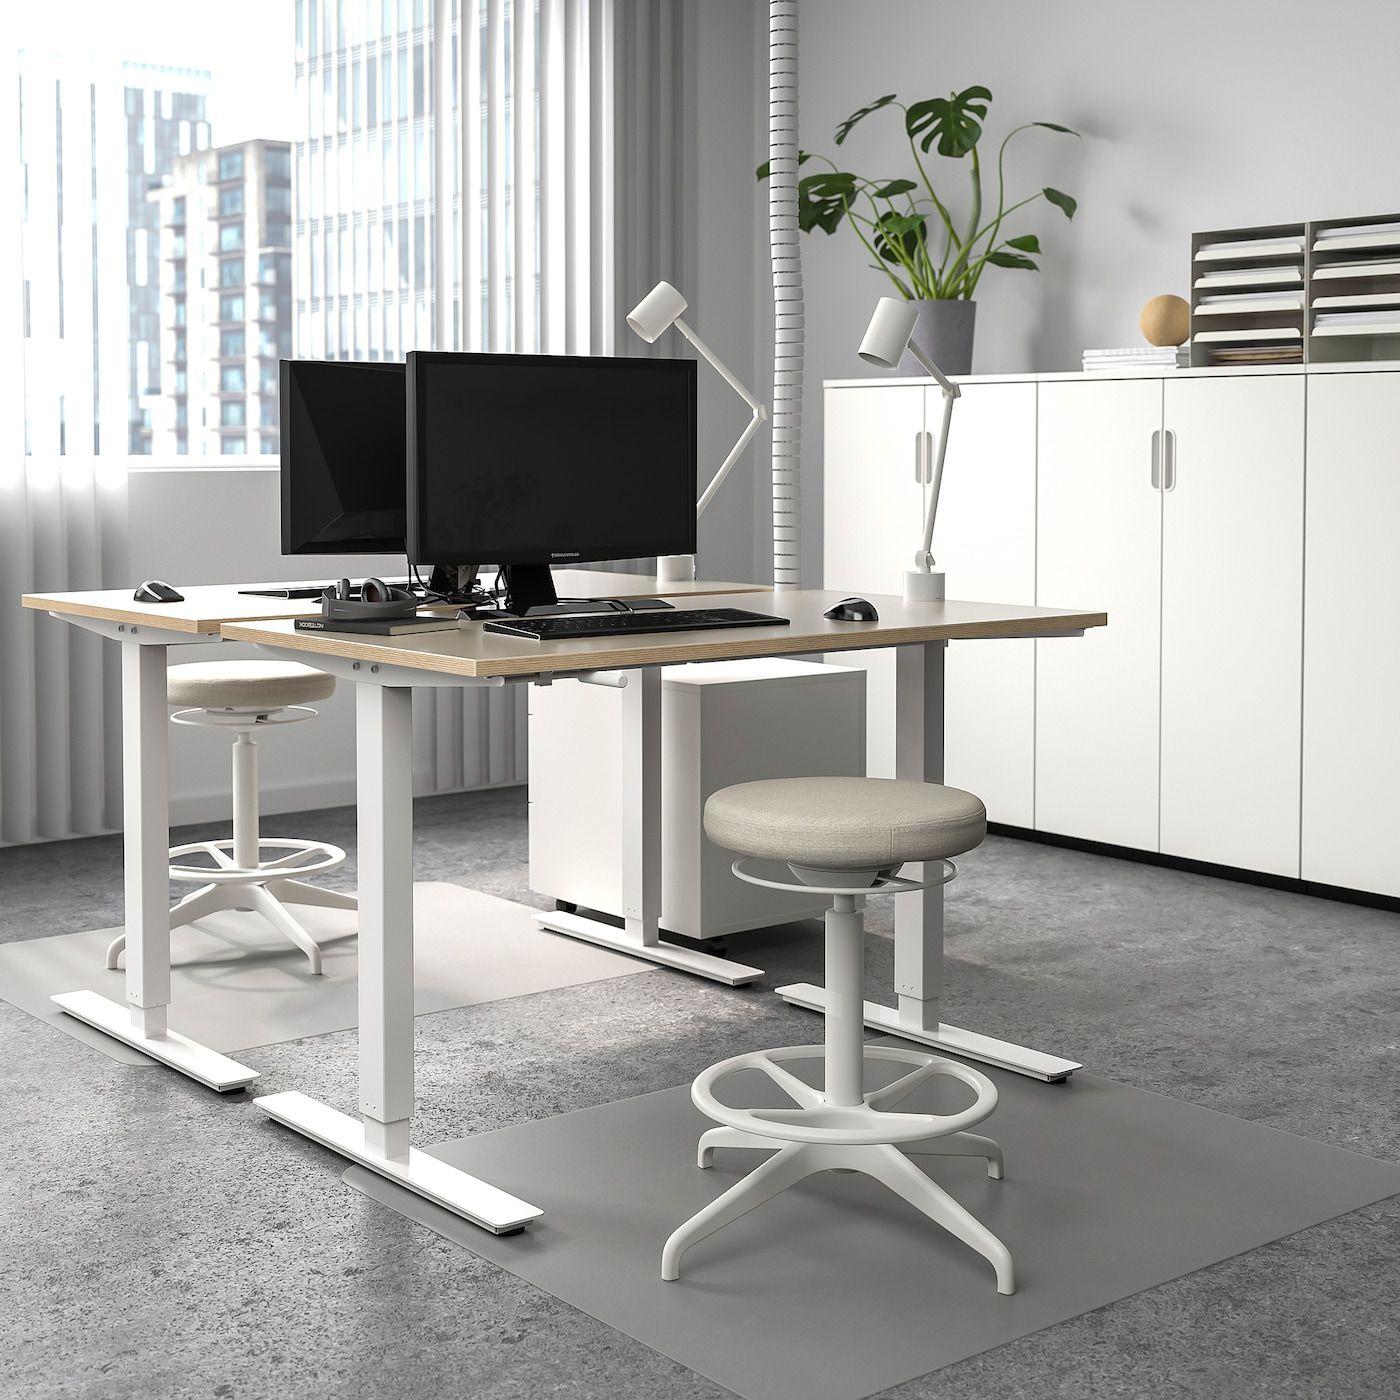 Skarsta Desk Sit Stand Beige White Ikea Canada Ikea In 2020 Ikea Standing Desk Home Office Design Standing Desk Office